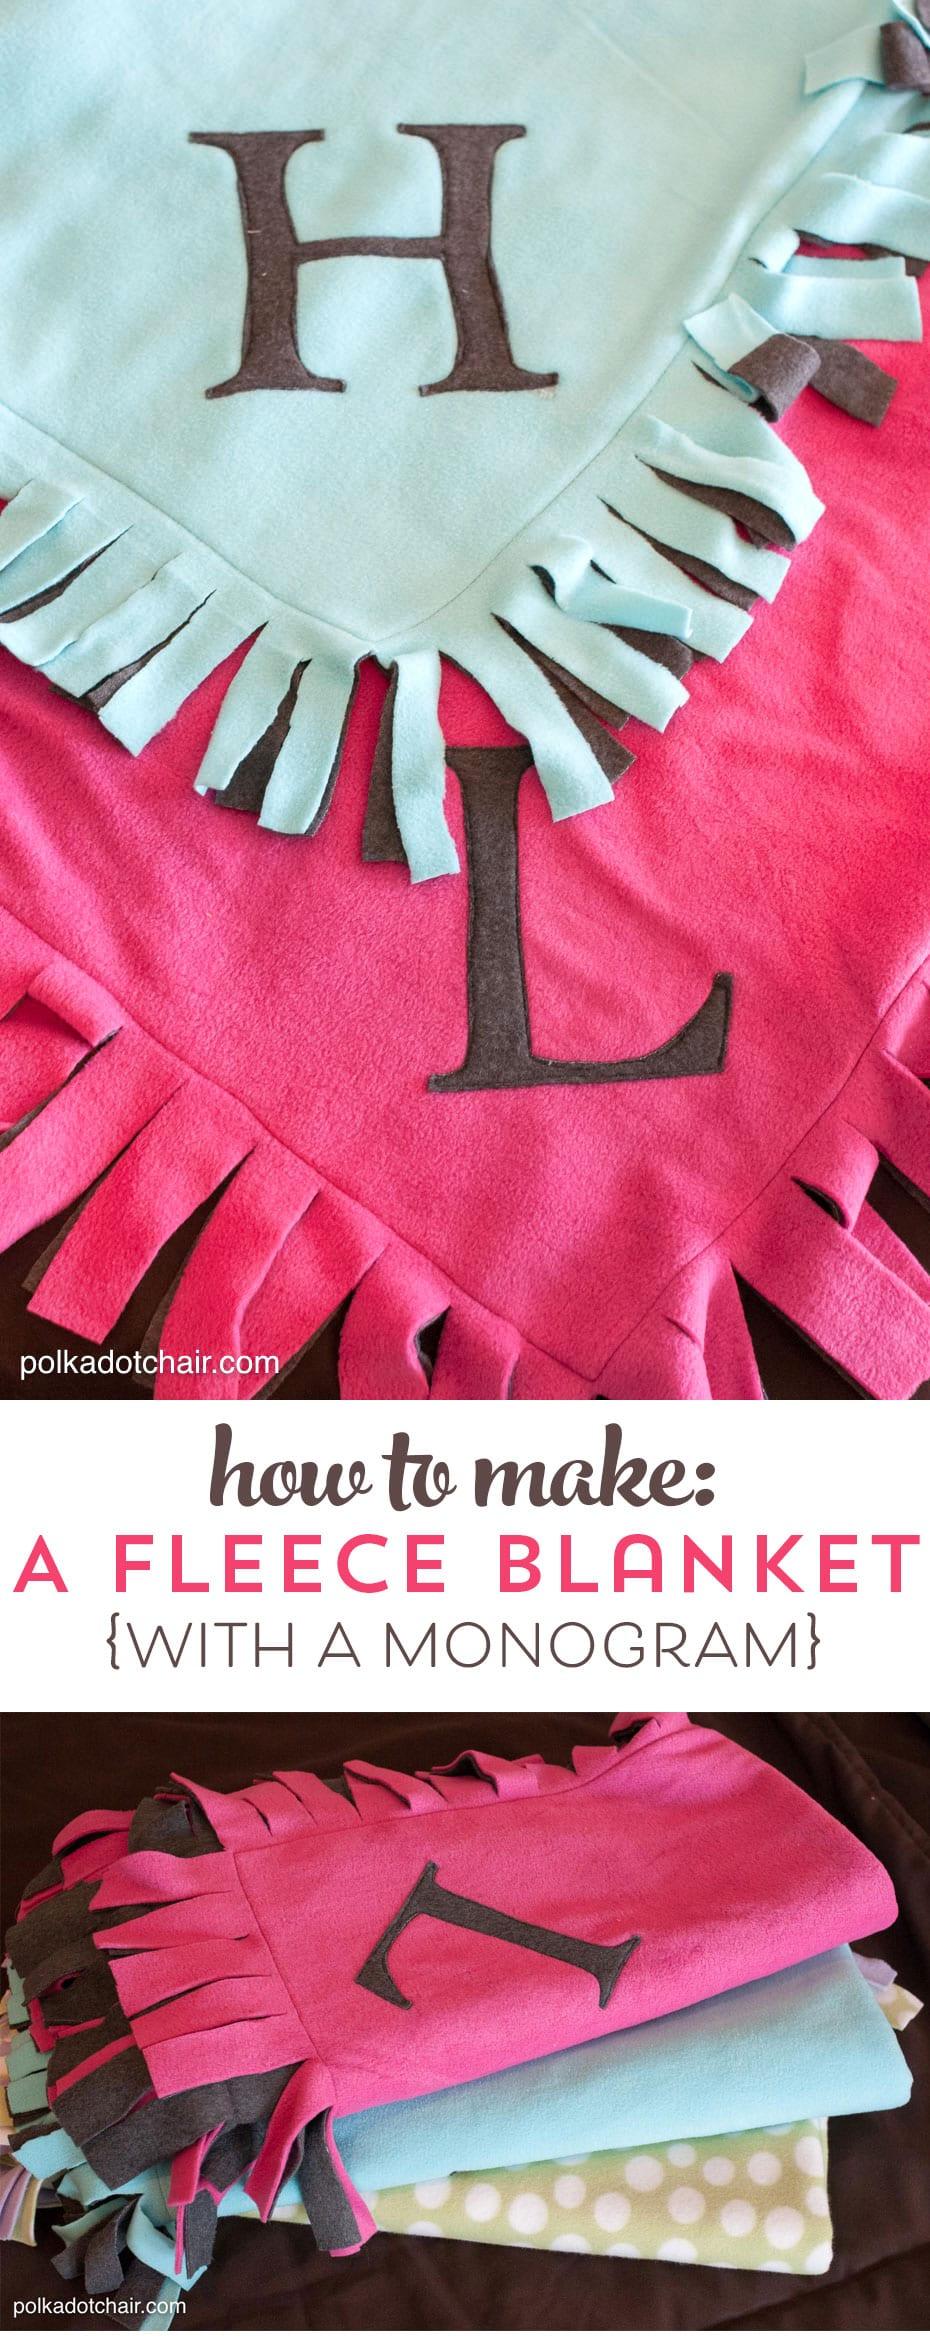 Easy Peasy Fleece Blanket Tutorial The Polkadot Chair